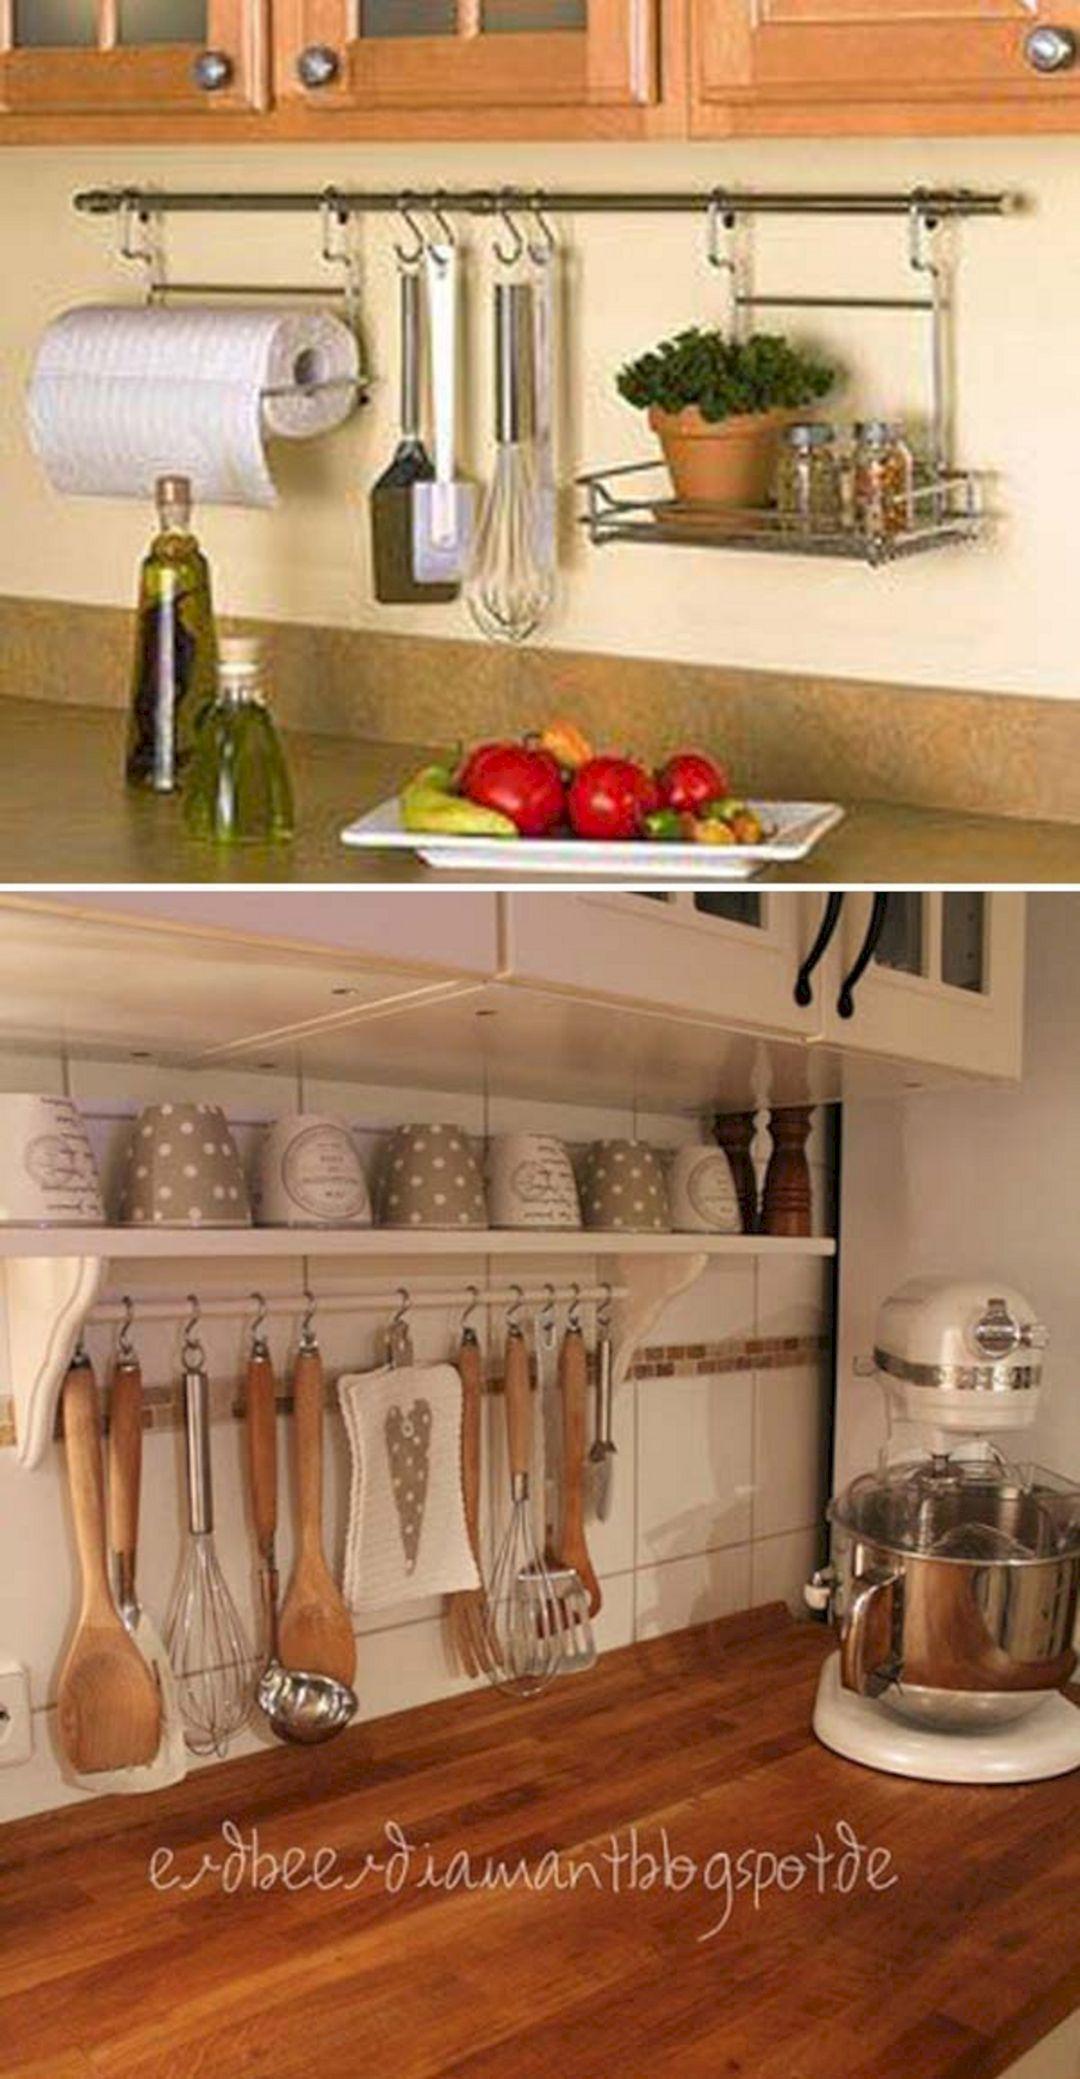 50 Best Small Kitchen Storage Ideas For Awesome Kitchen Organization Smallk In 2020 Apartment Kitchen Organization Declutter Kitchen Clutter Free Kitchen Countertops